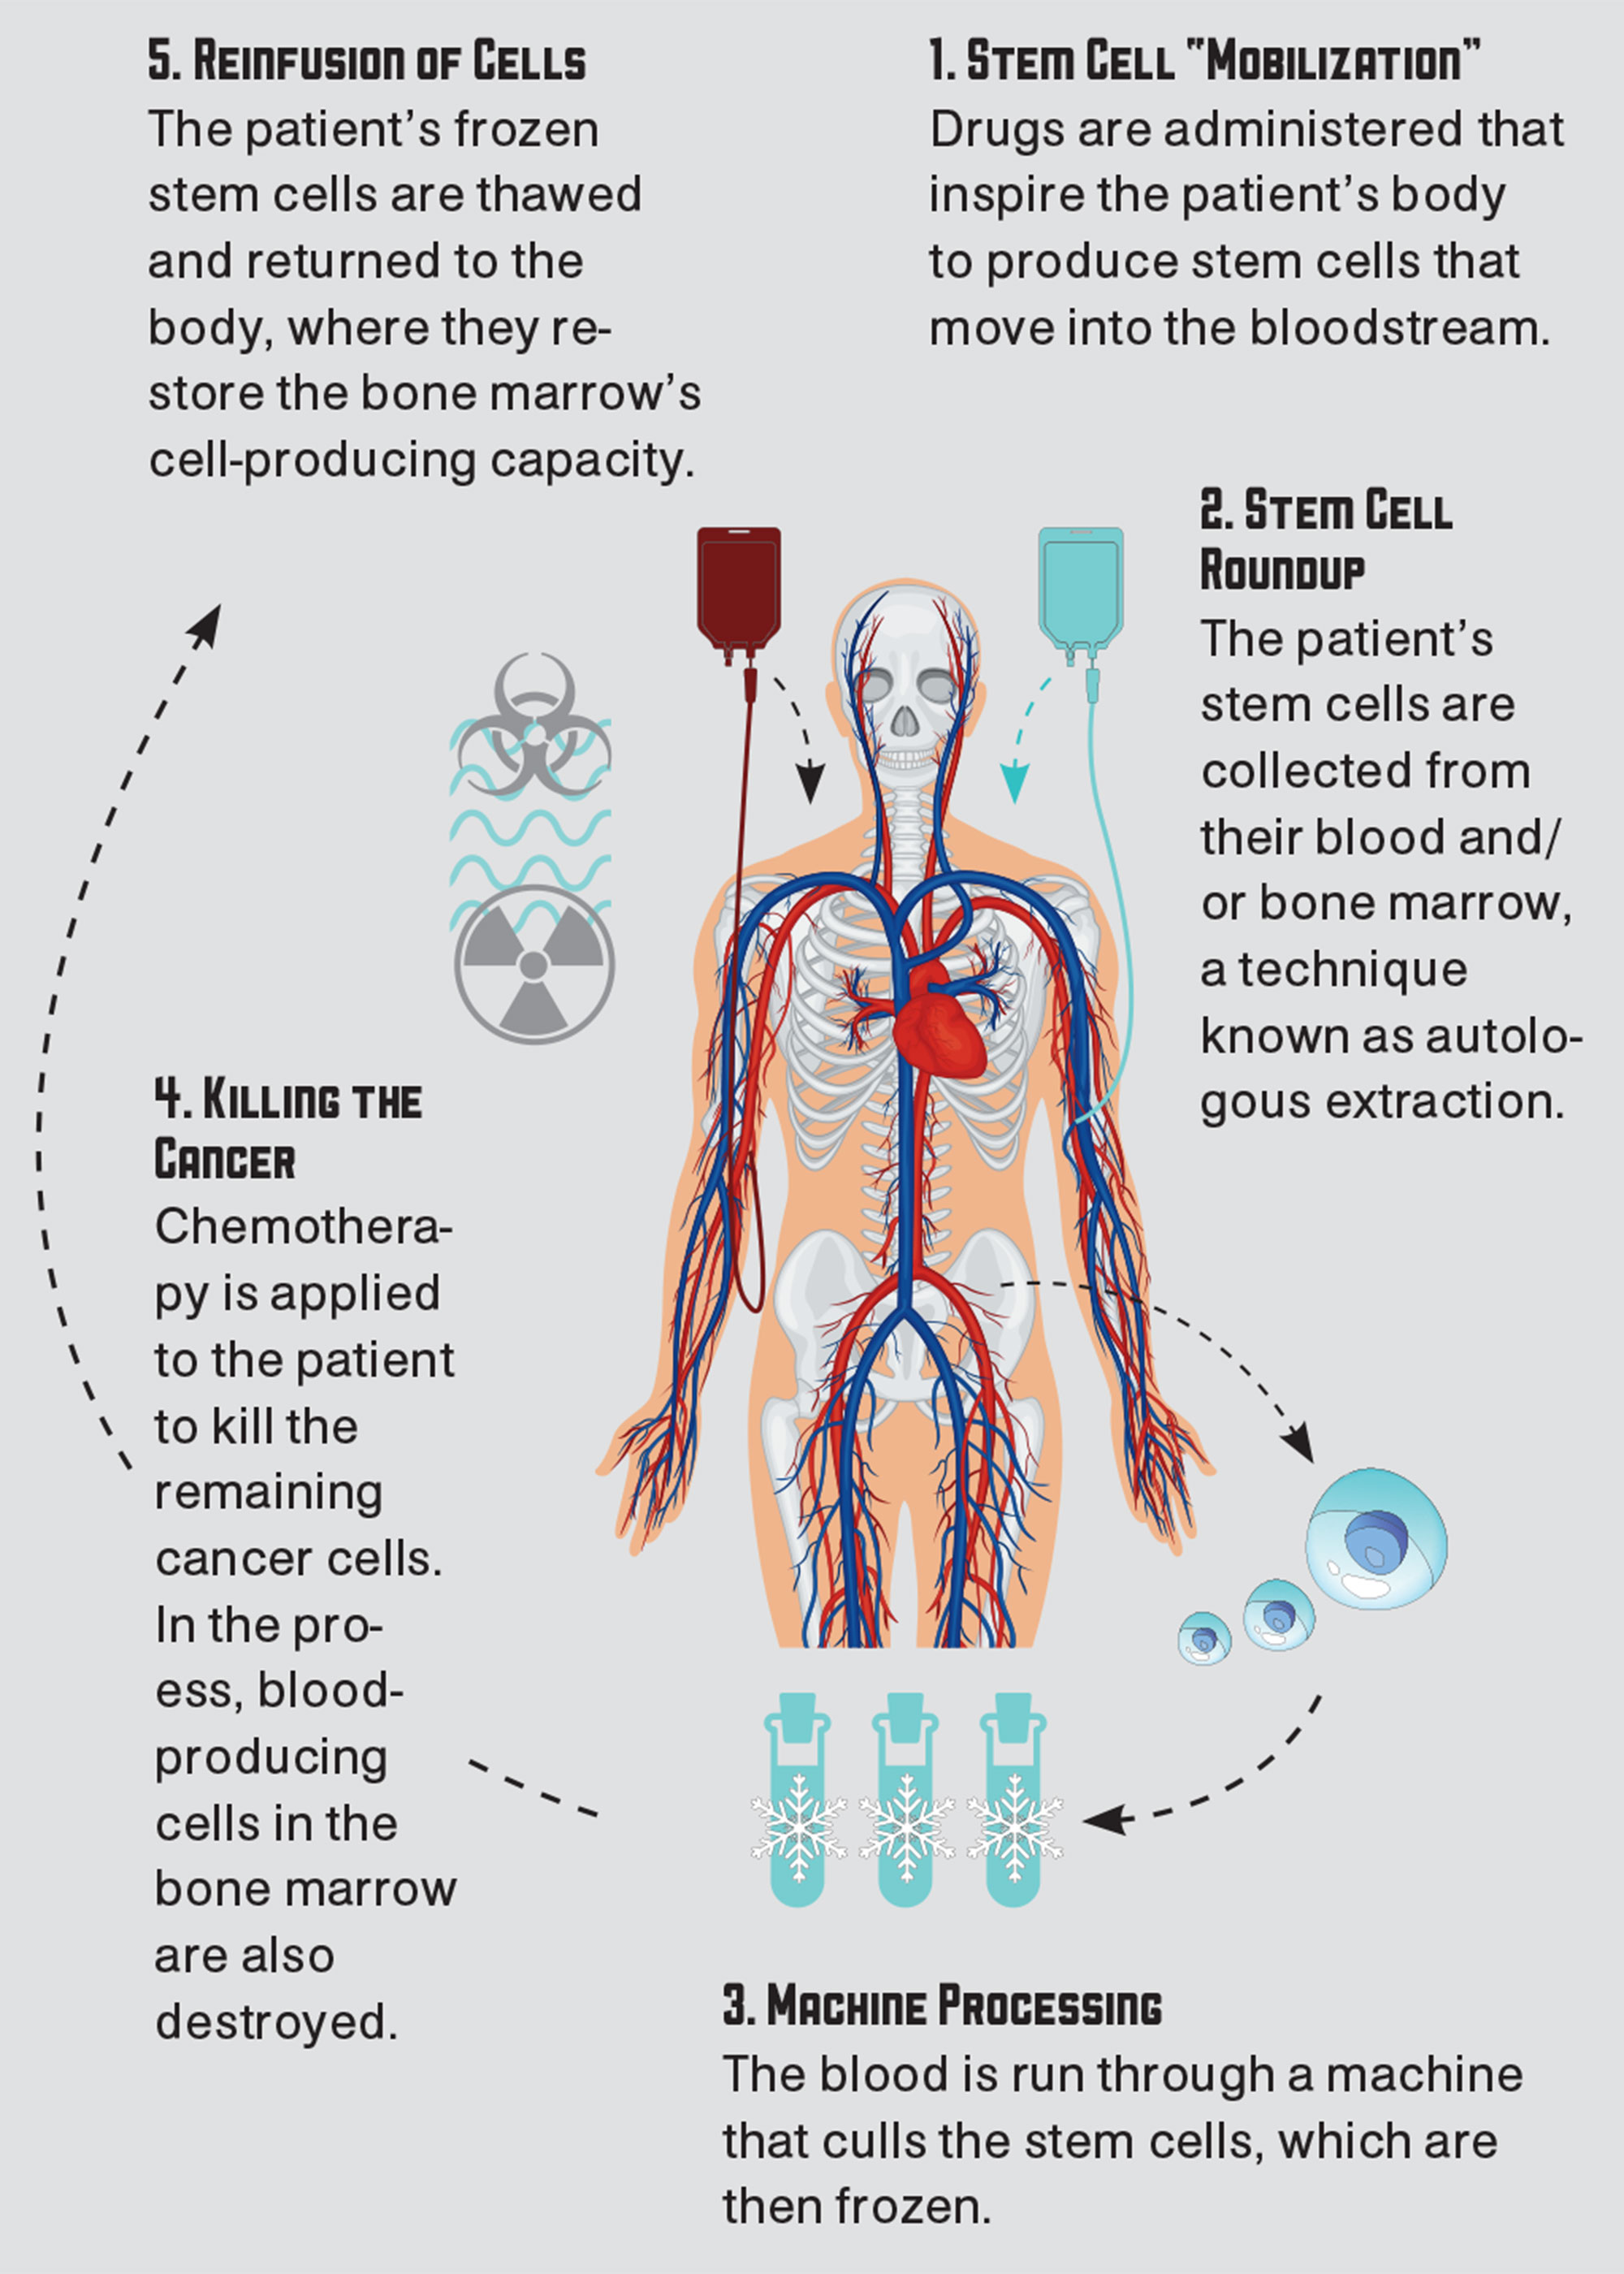 Infographics courtesy Adobe Stock Images